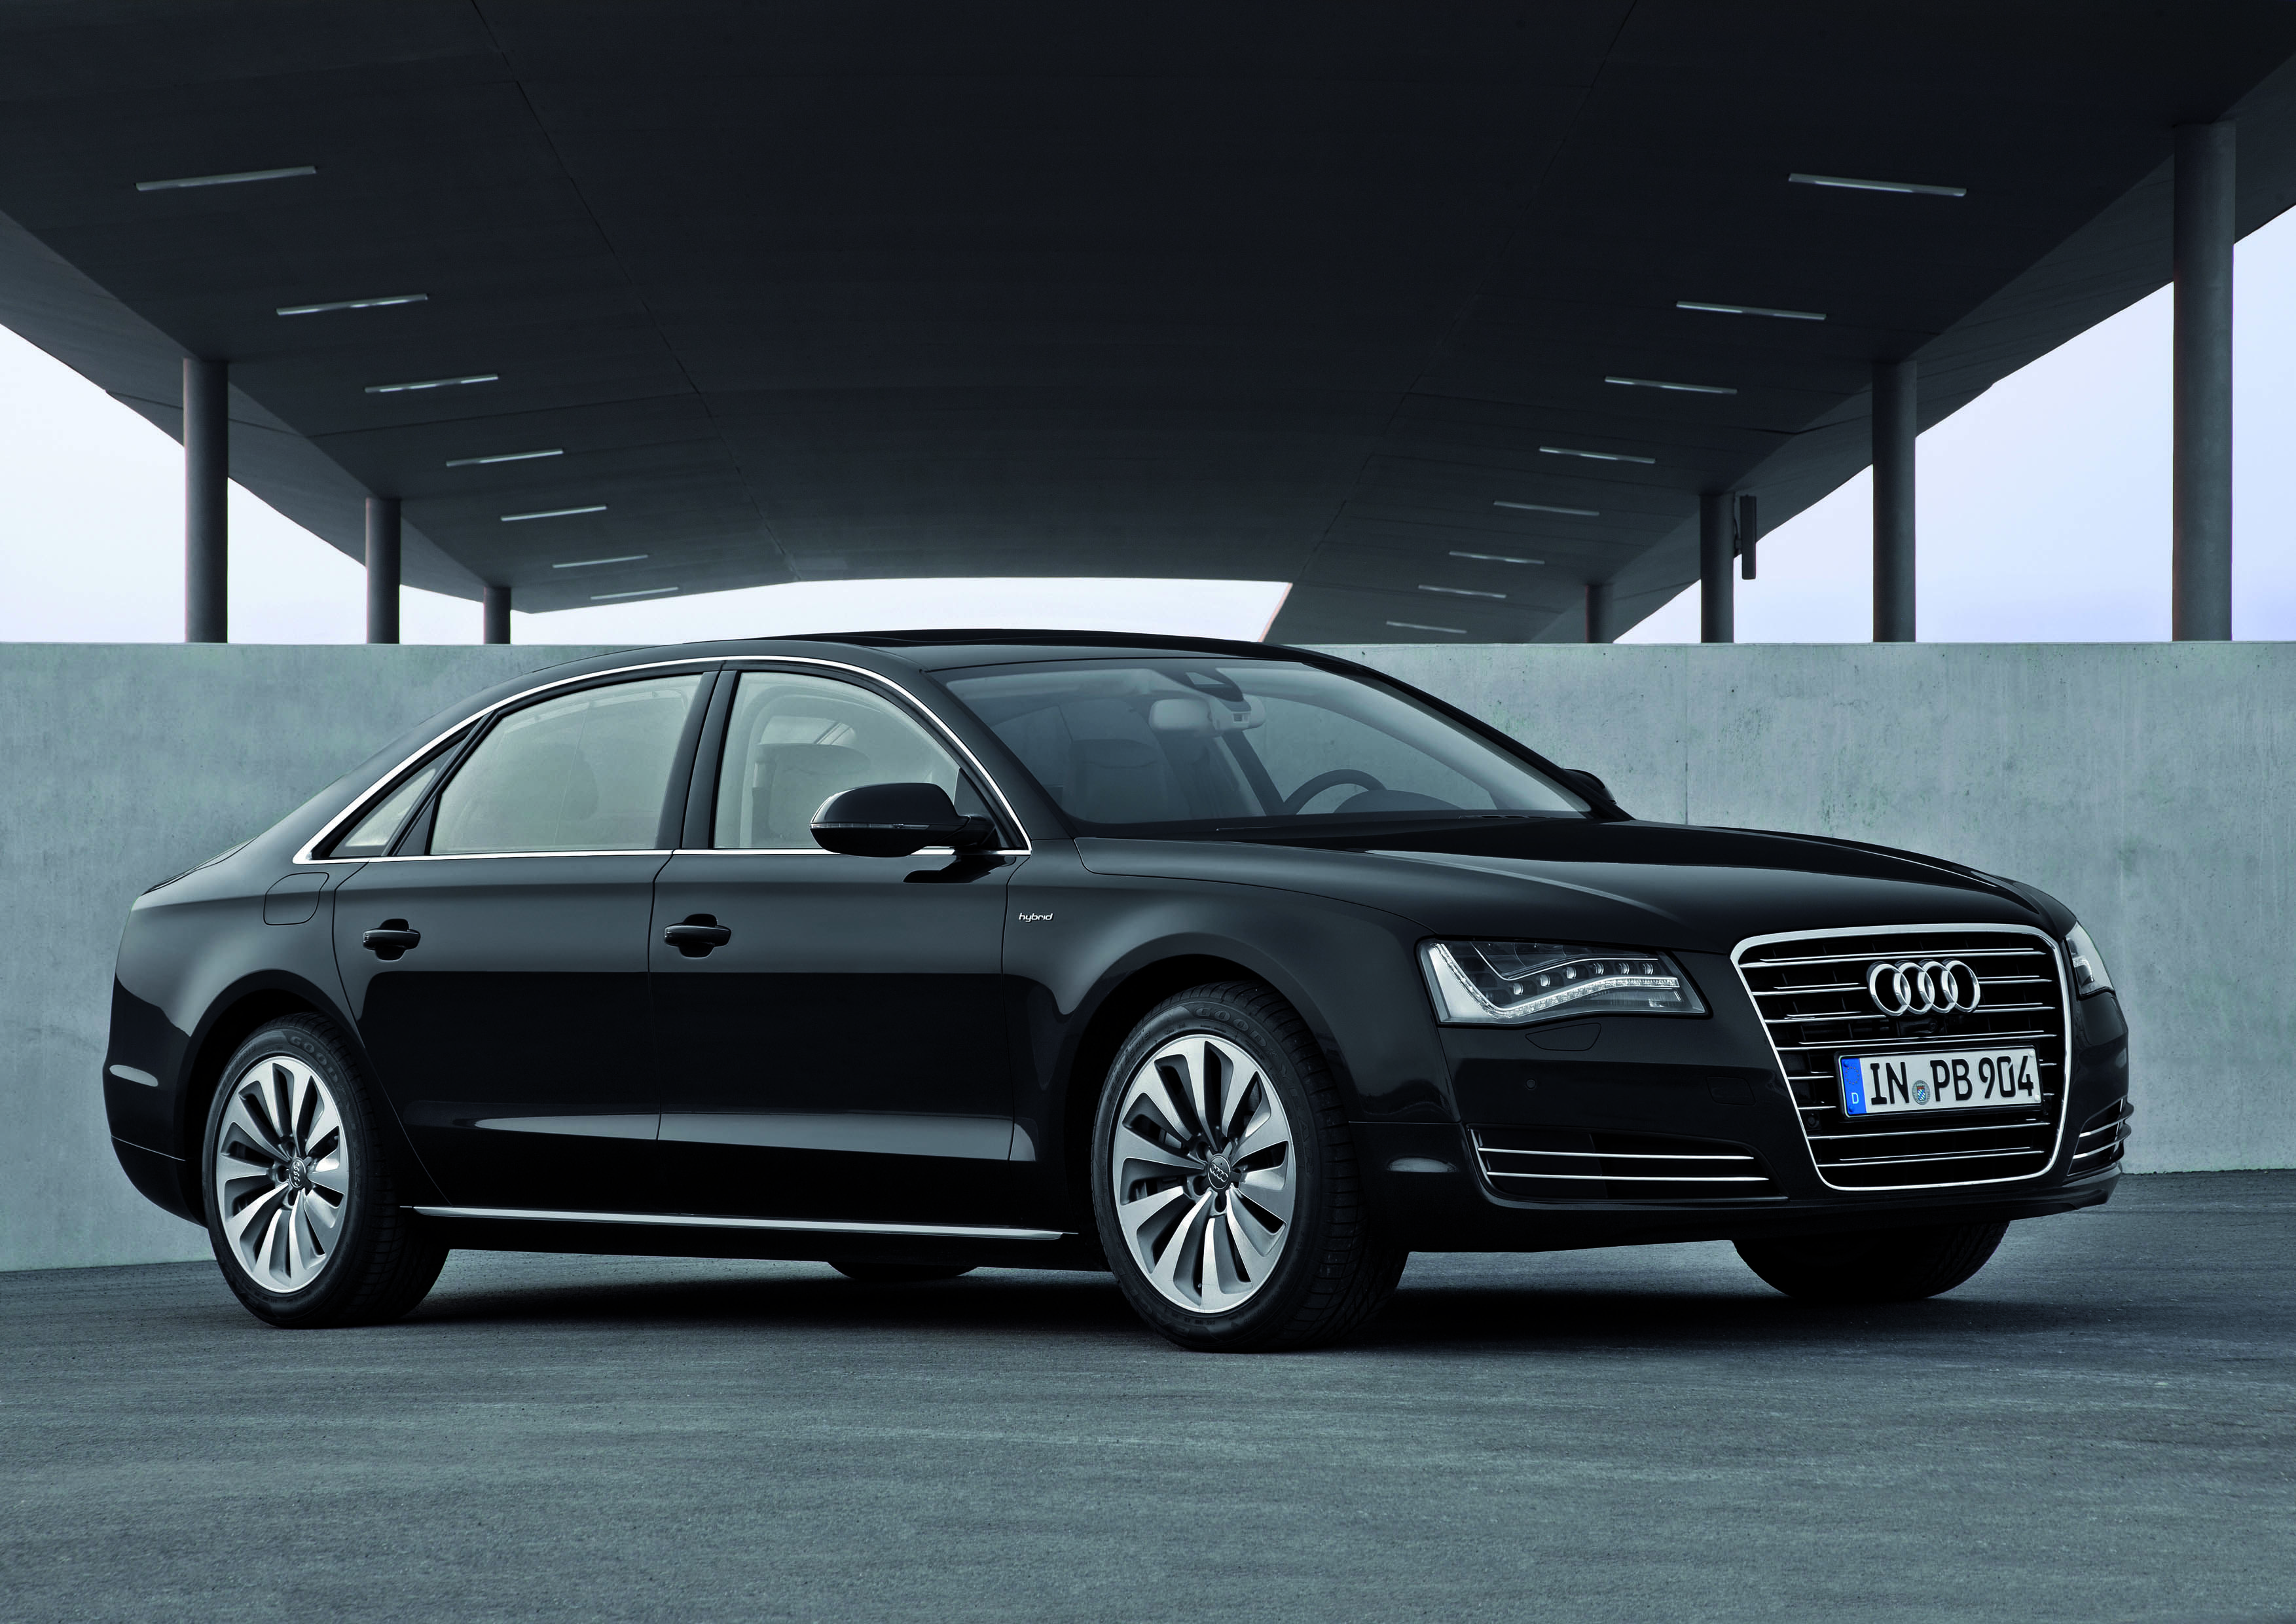 2013 audi hybrid is the world most efficient luxury class hybrid sedan audi hybrid also the only one full hybrid sedan in europe